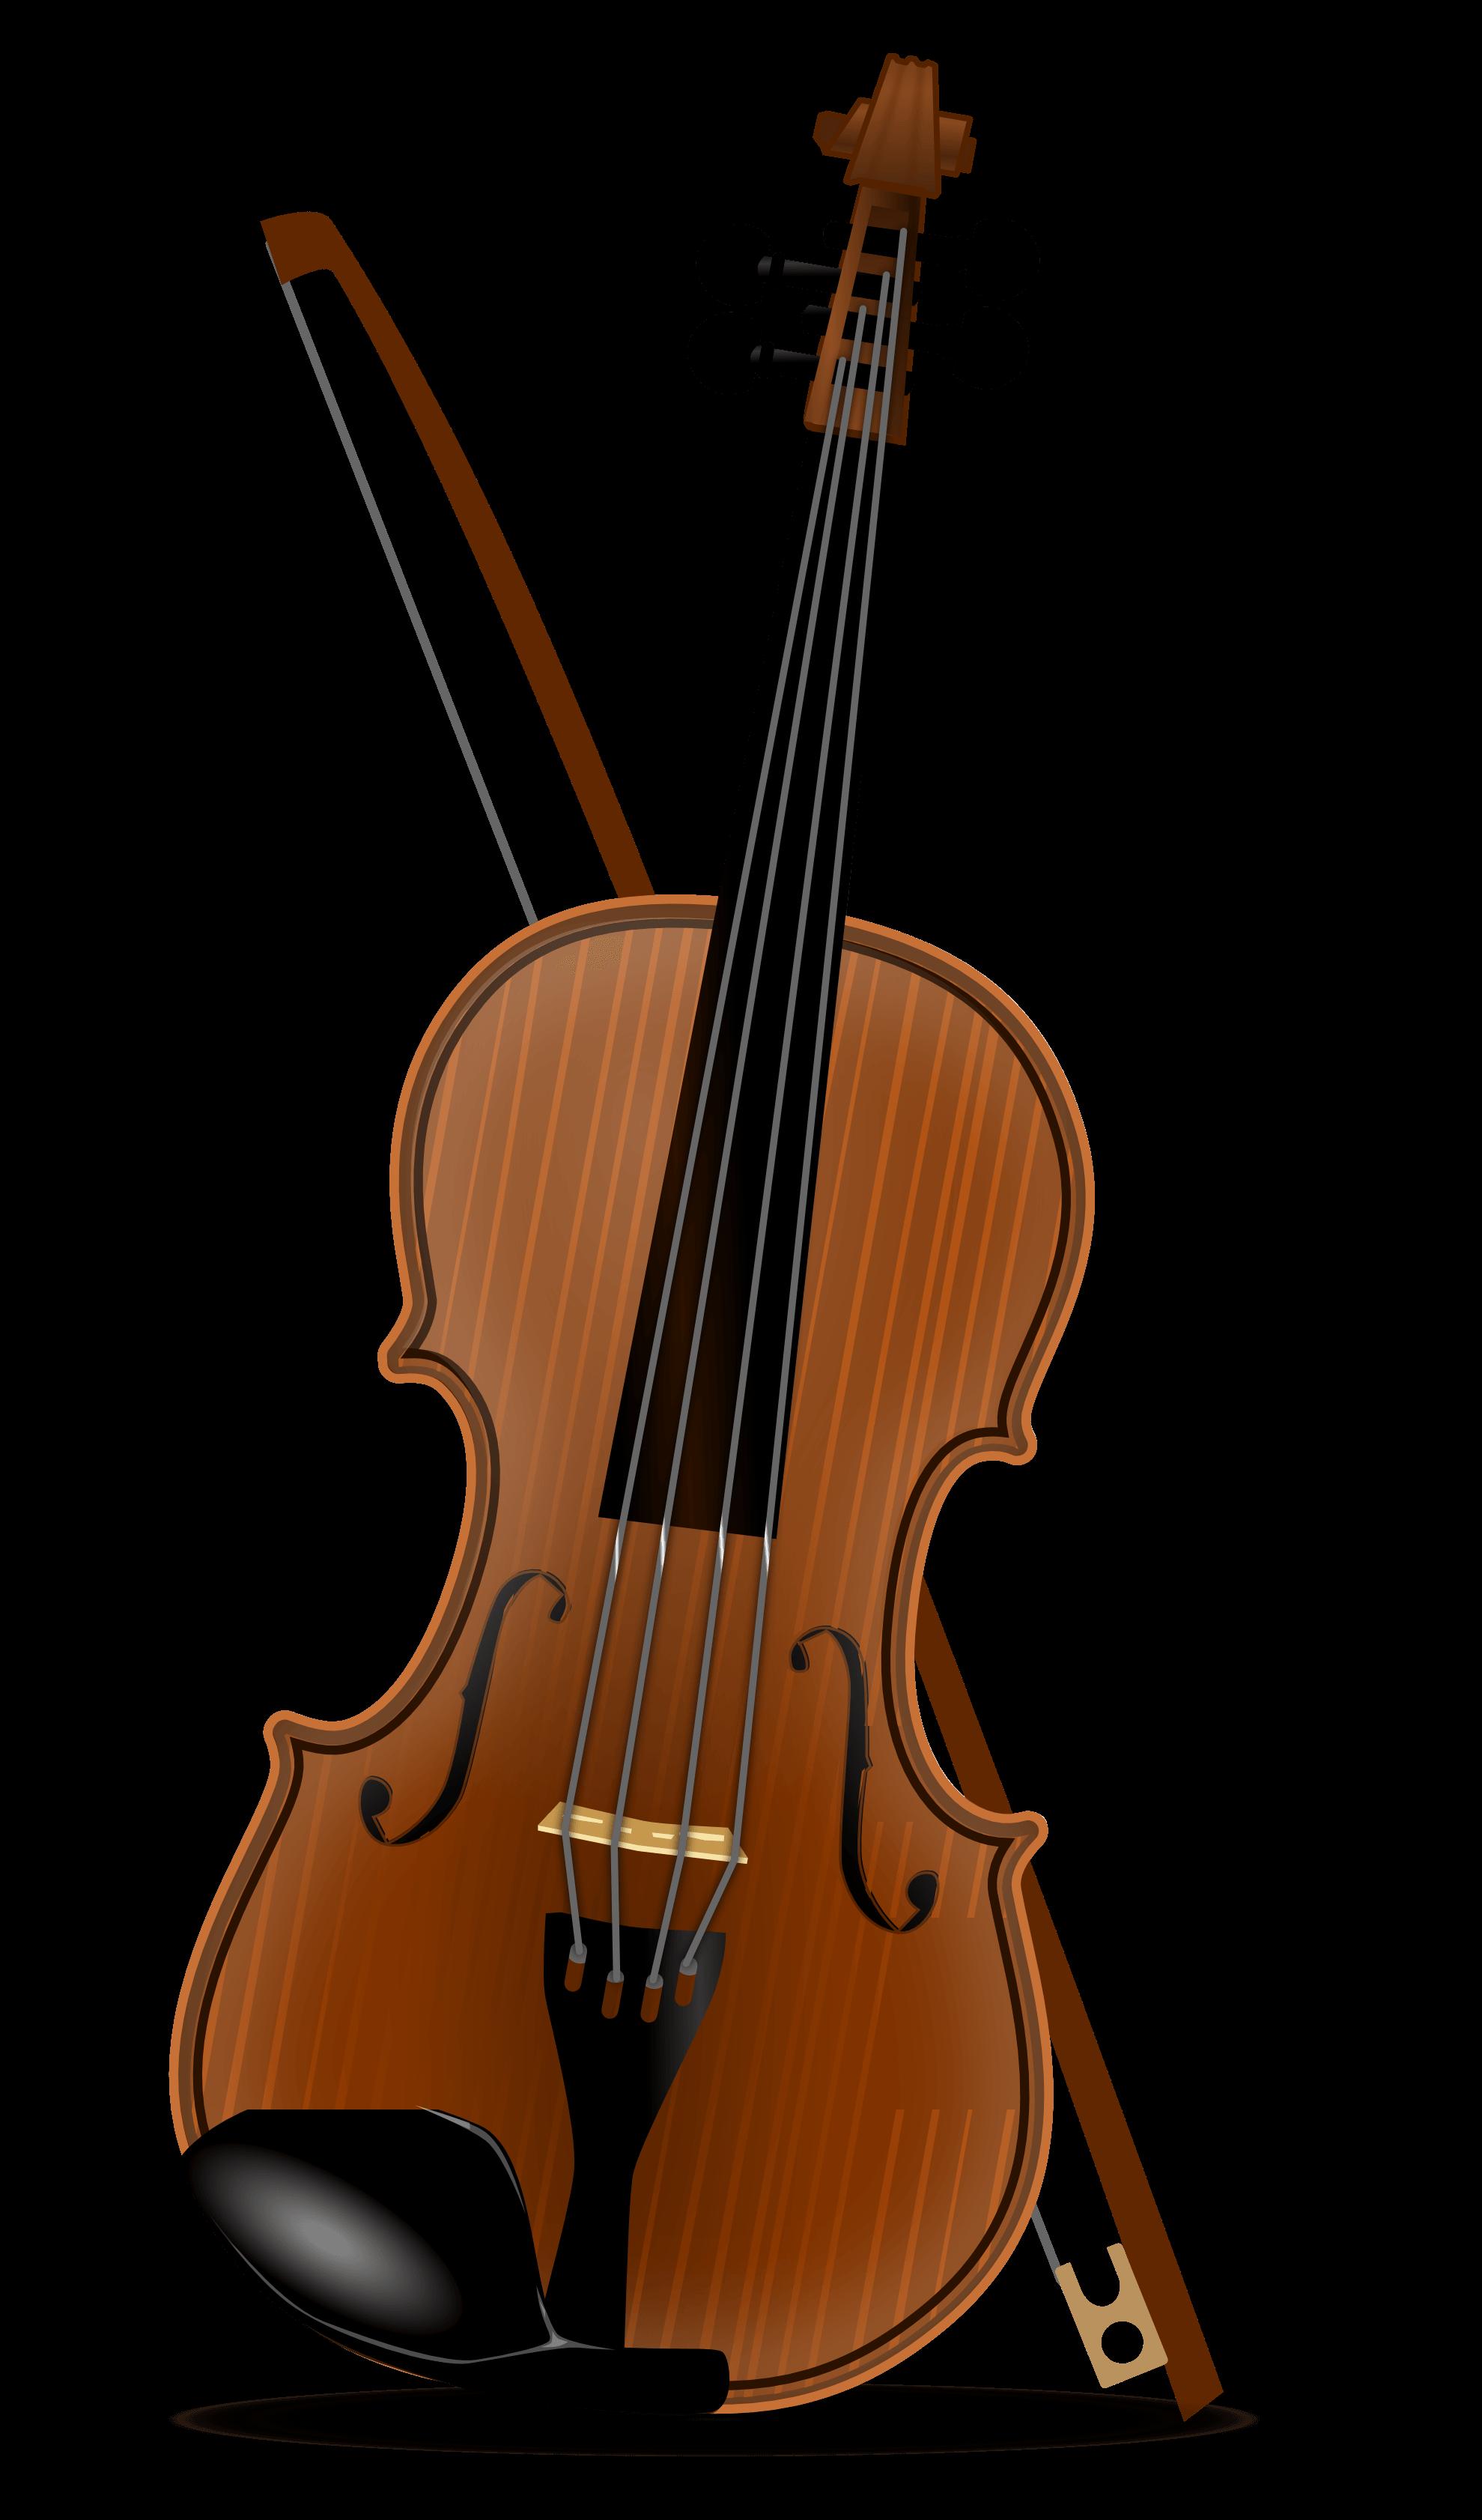 violin clip art violin black white line art christmas xmas.